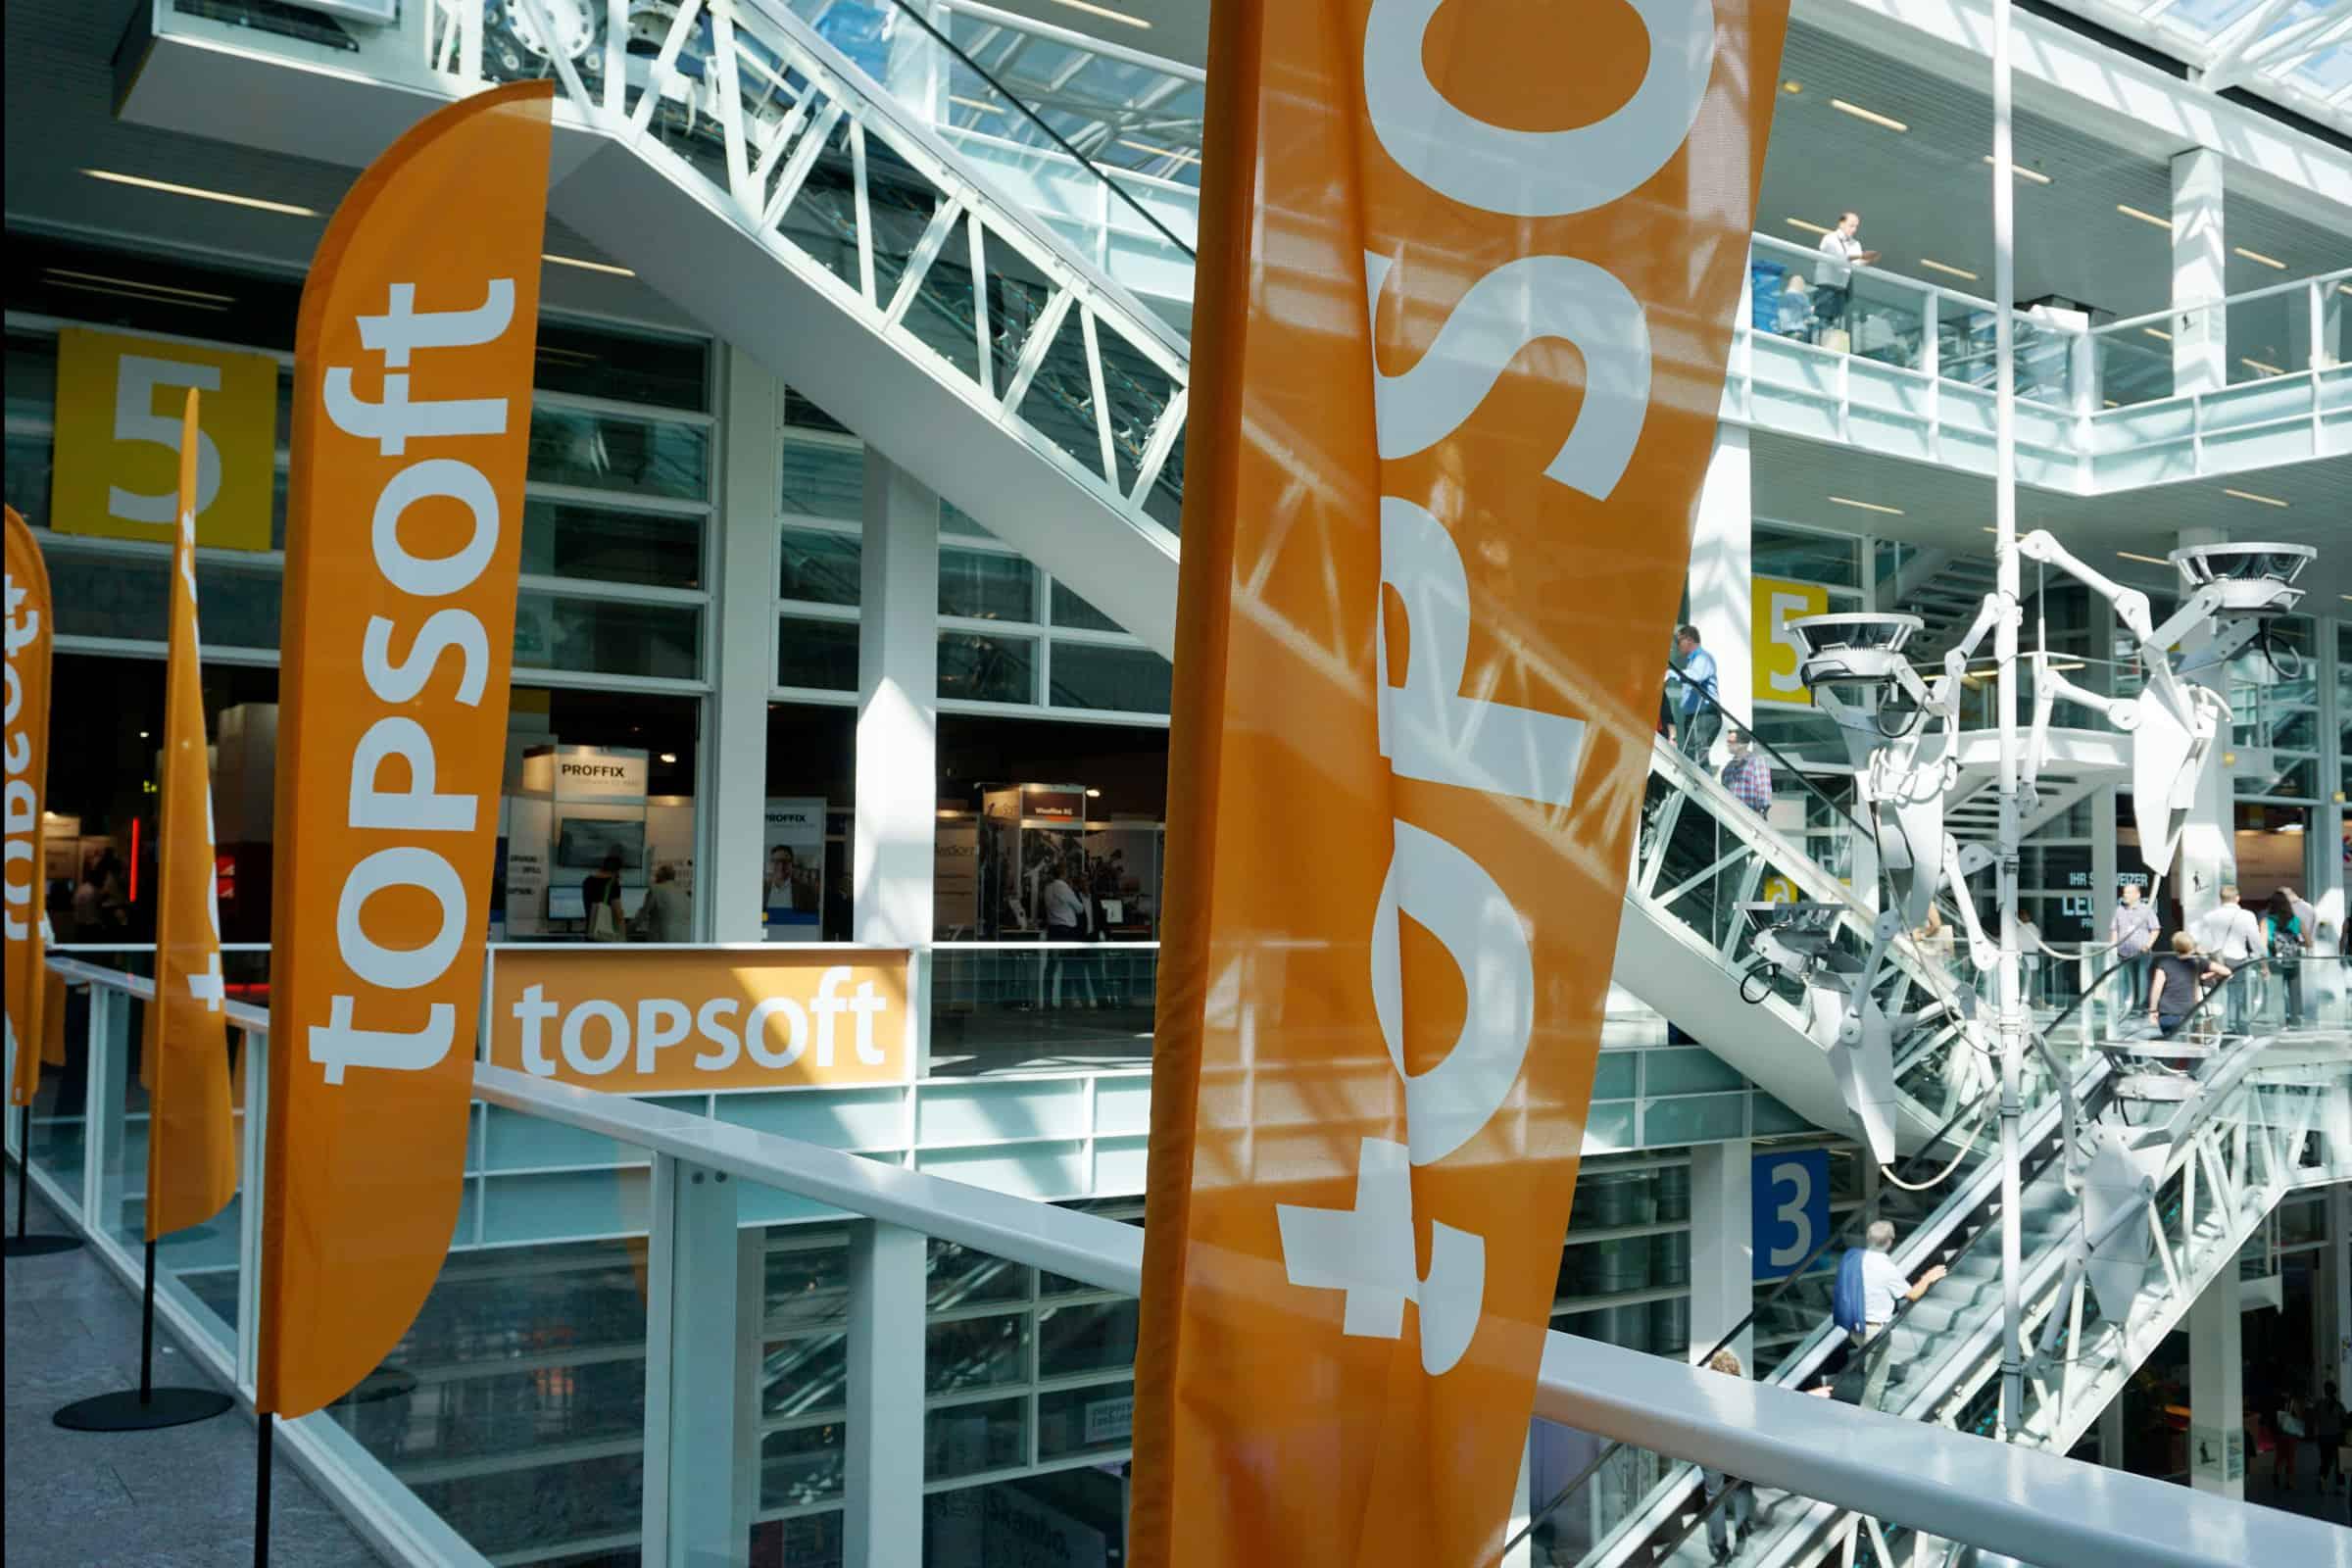 TopSoft-Messe 2018